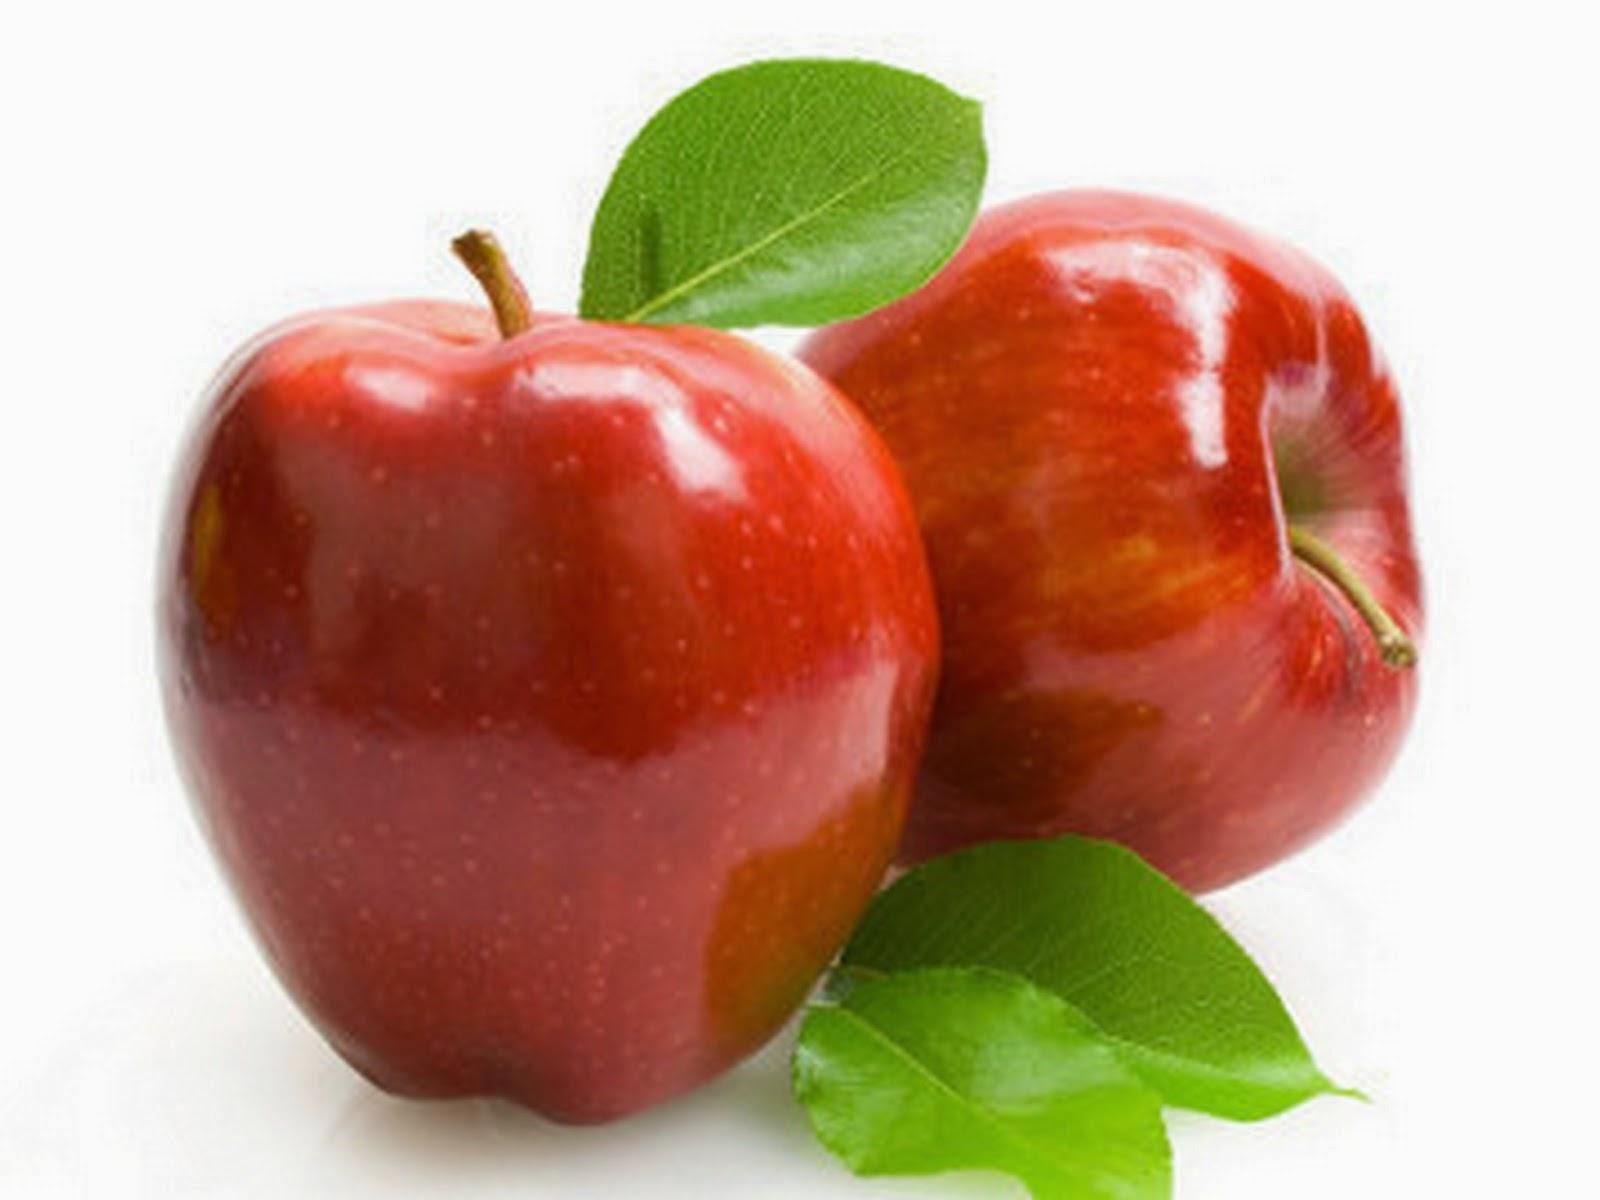 Dapatkan Manfaat dari Buah Apel